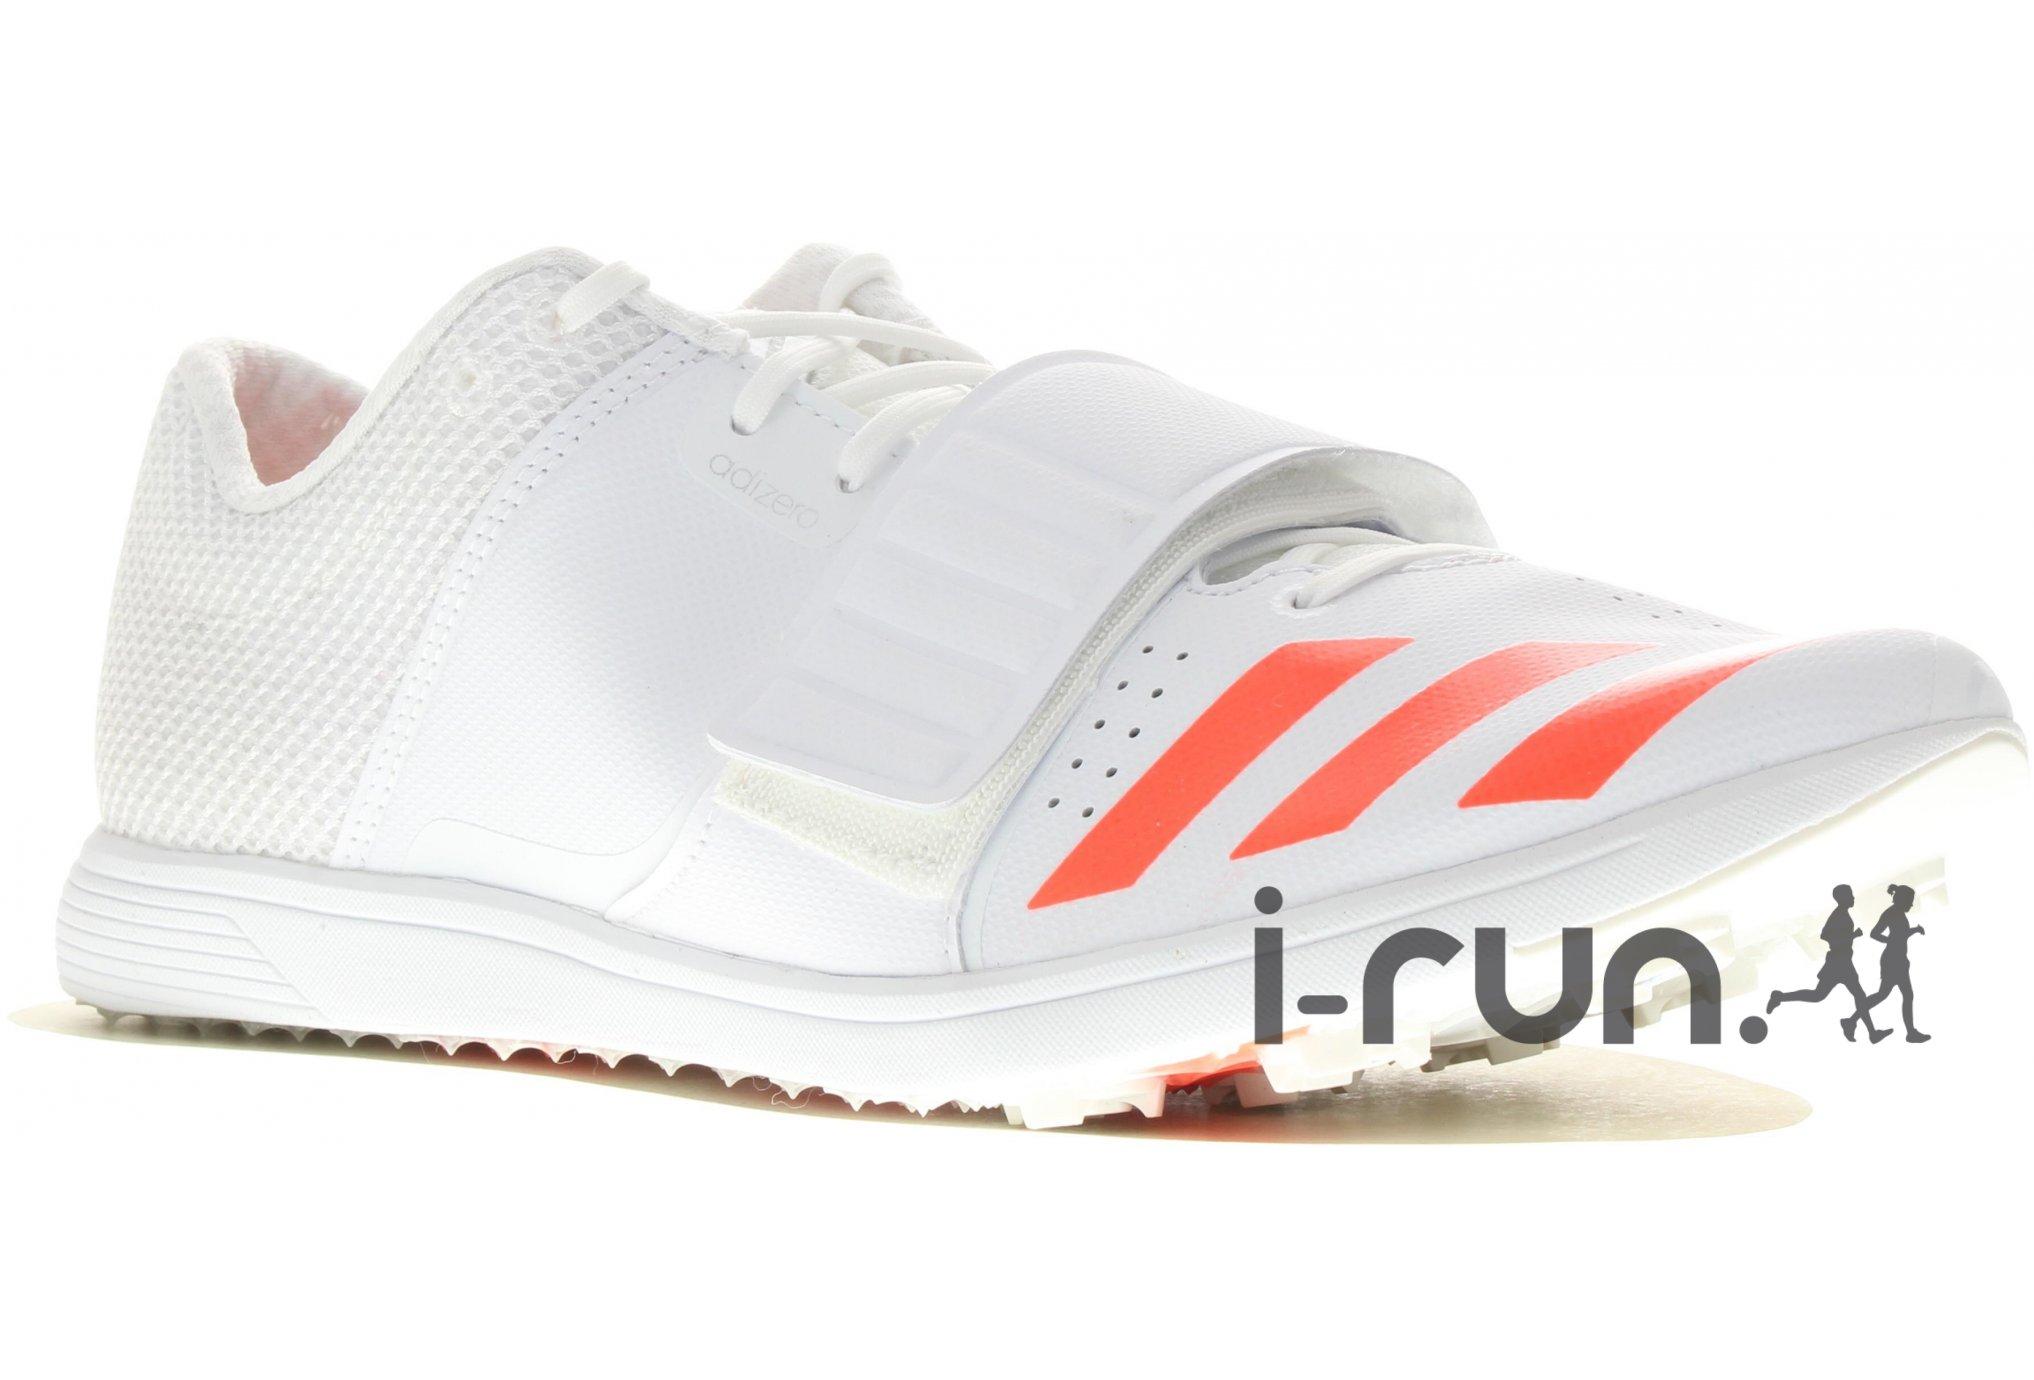 Adidas adizero tjpv m chaussures homme